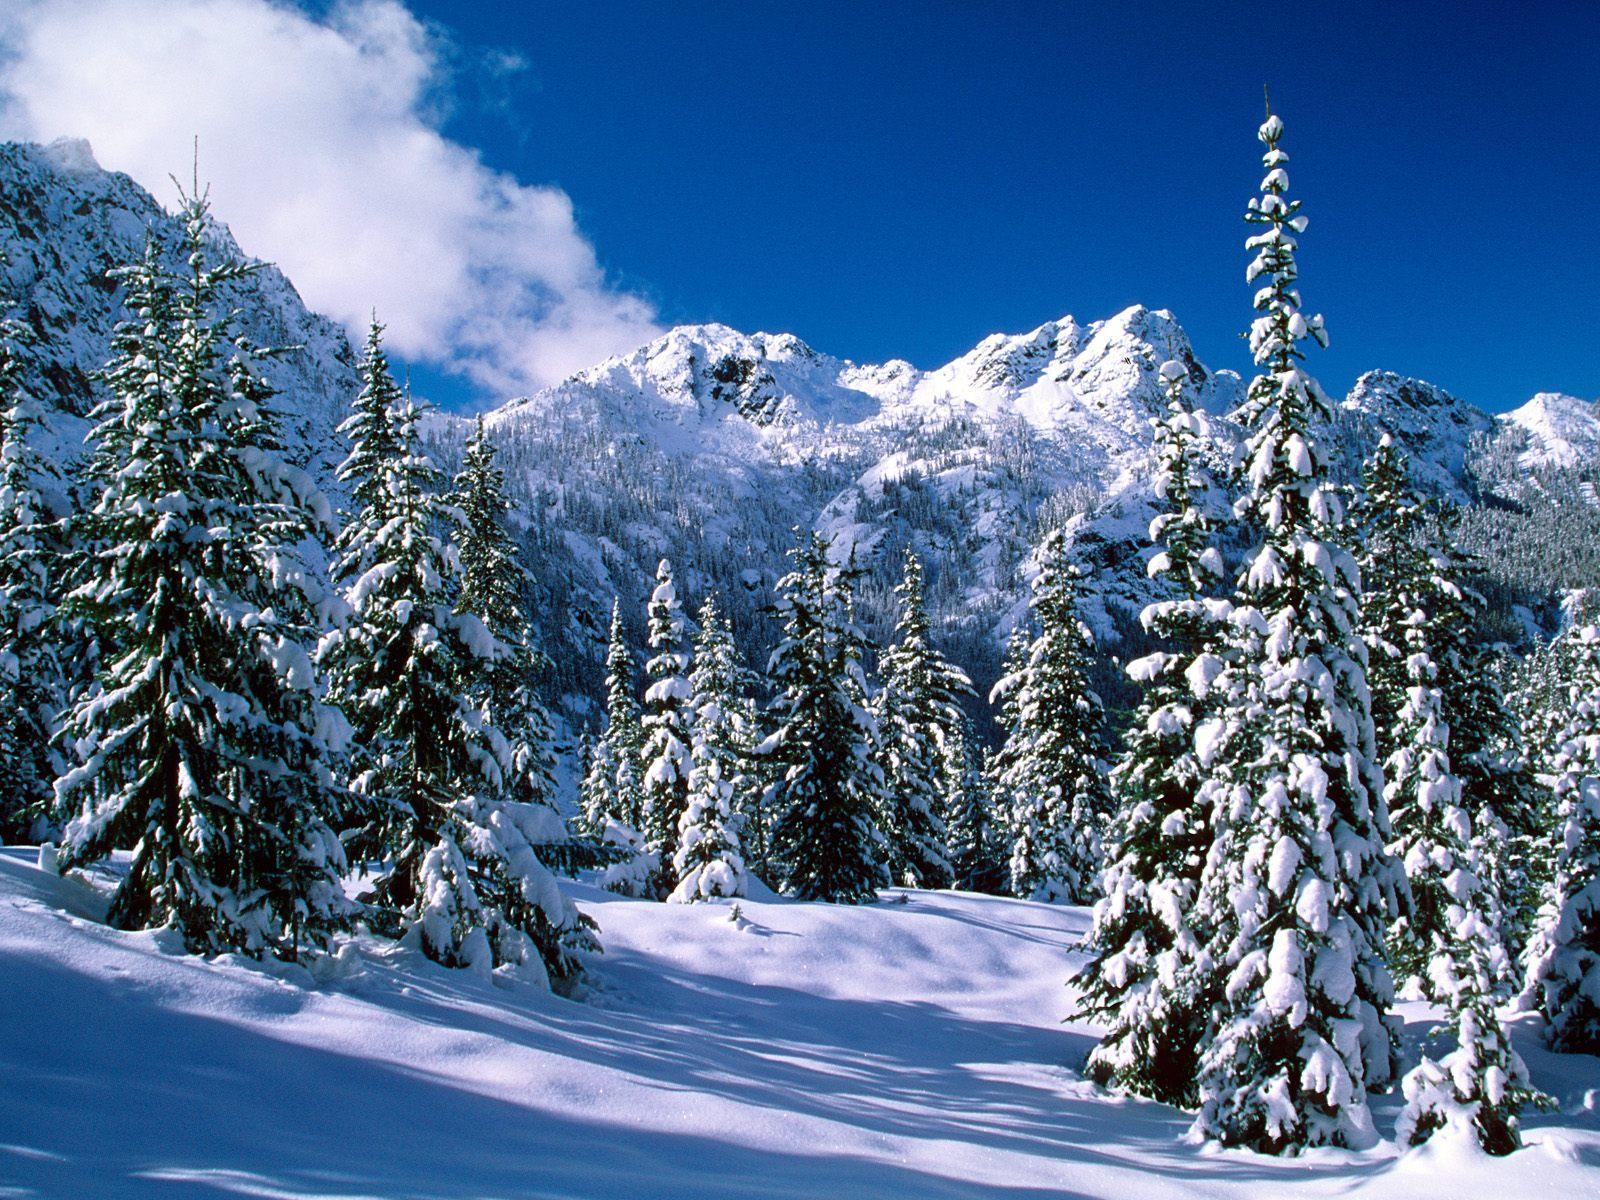 winter hd wallpaper winter hd wallpaper winter hd wallpaper winter hd 1600x1200